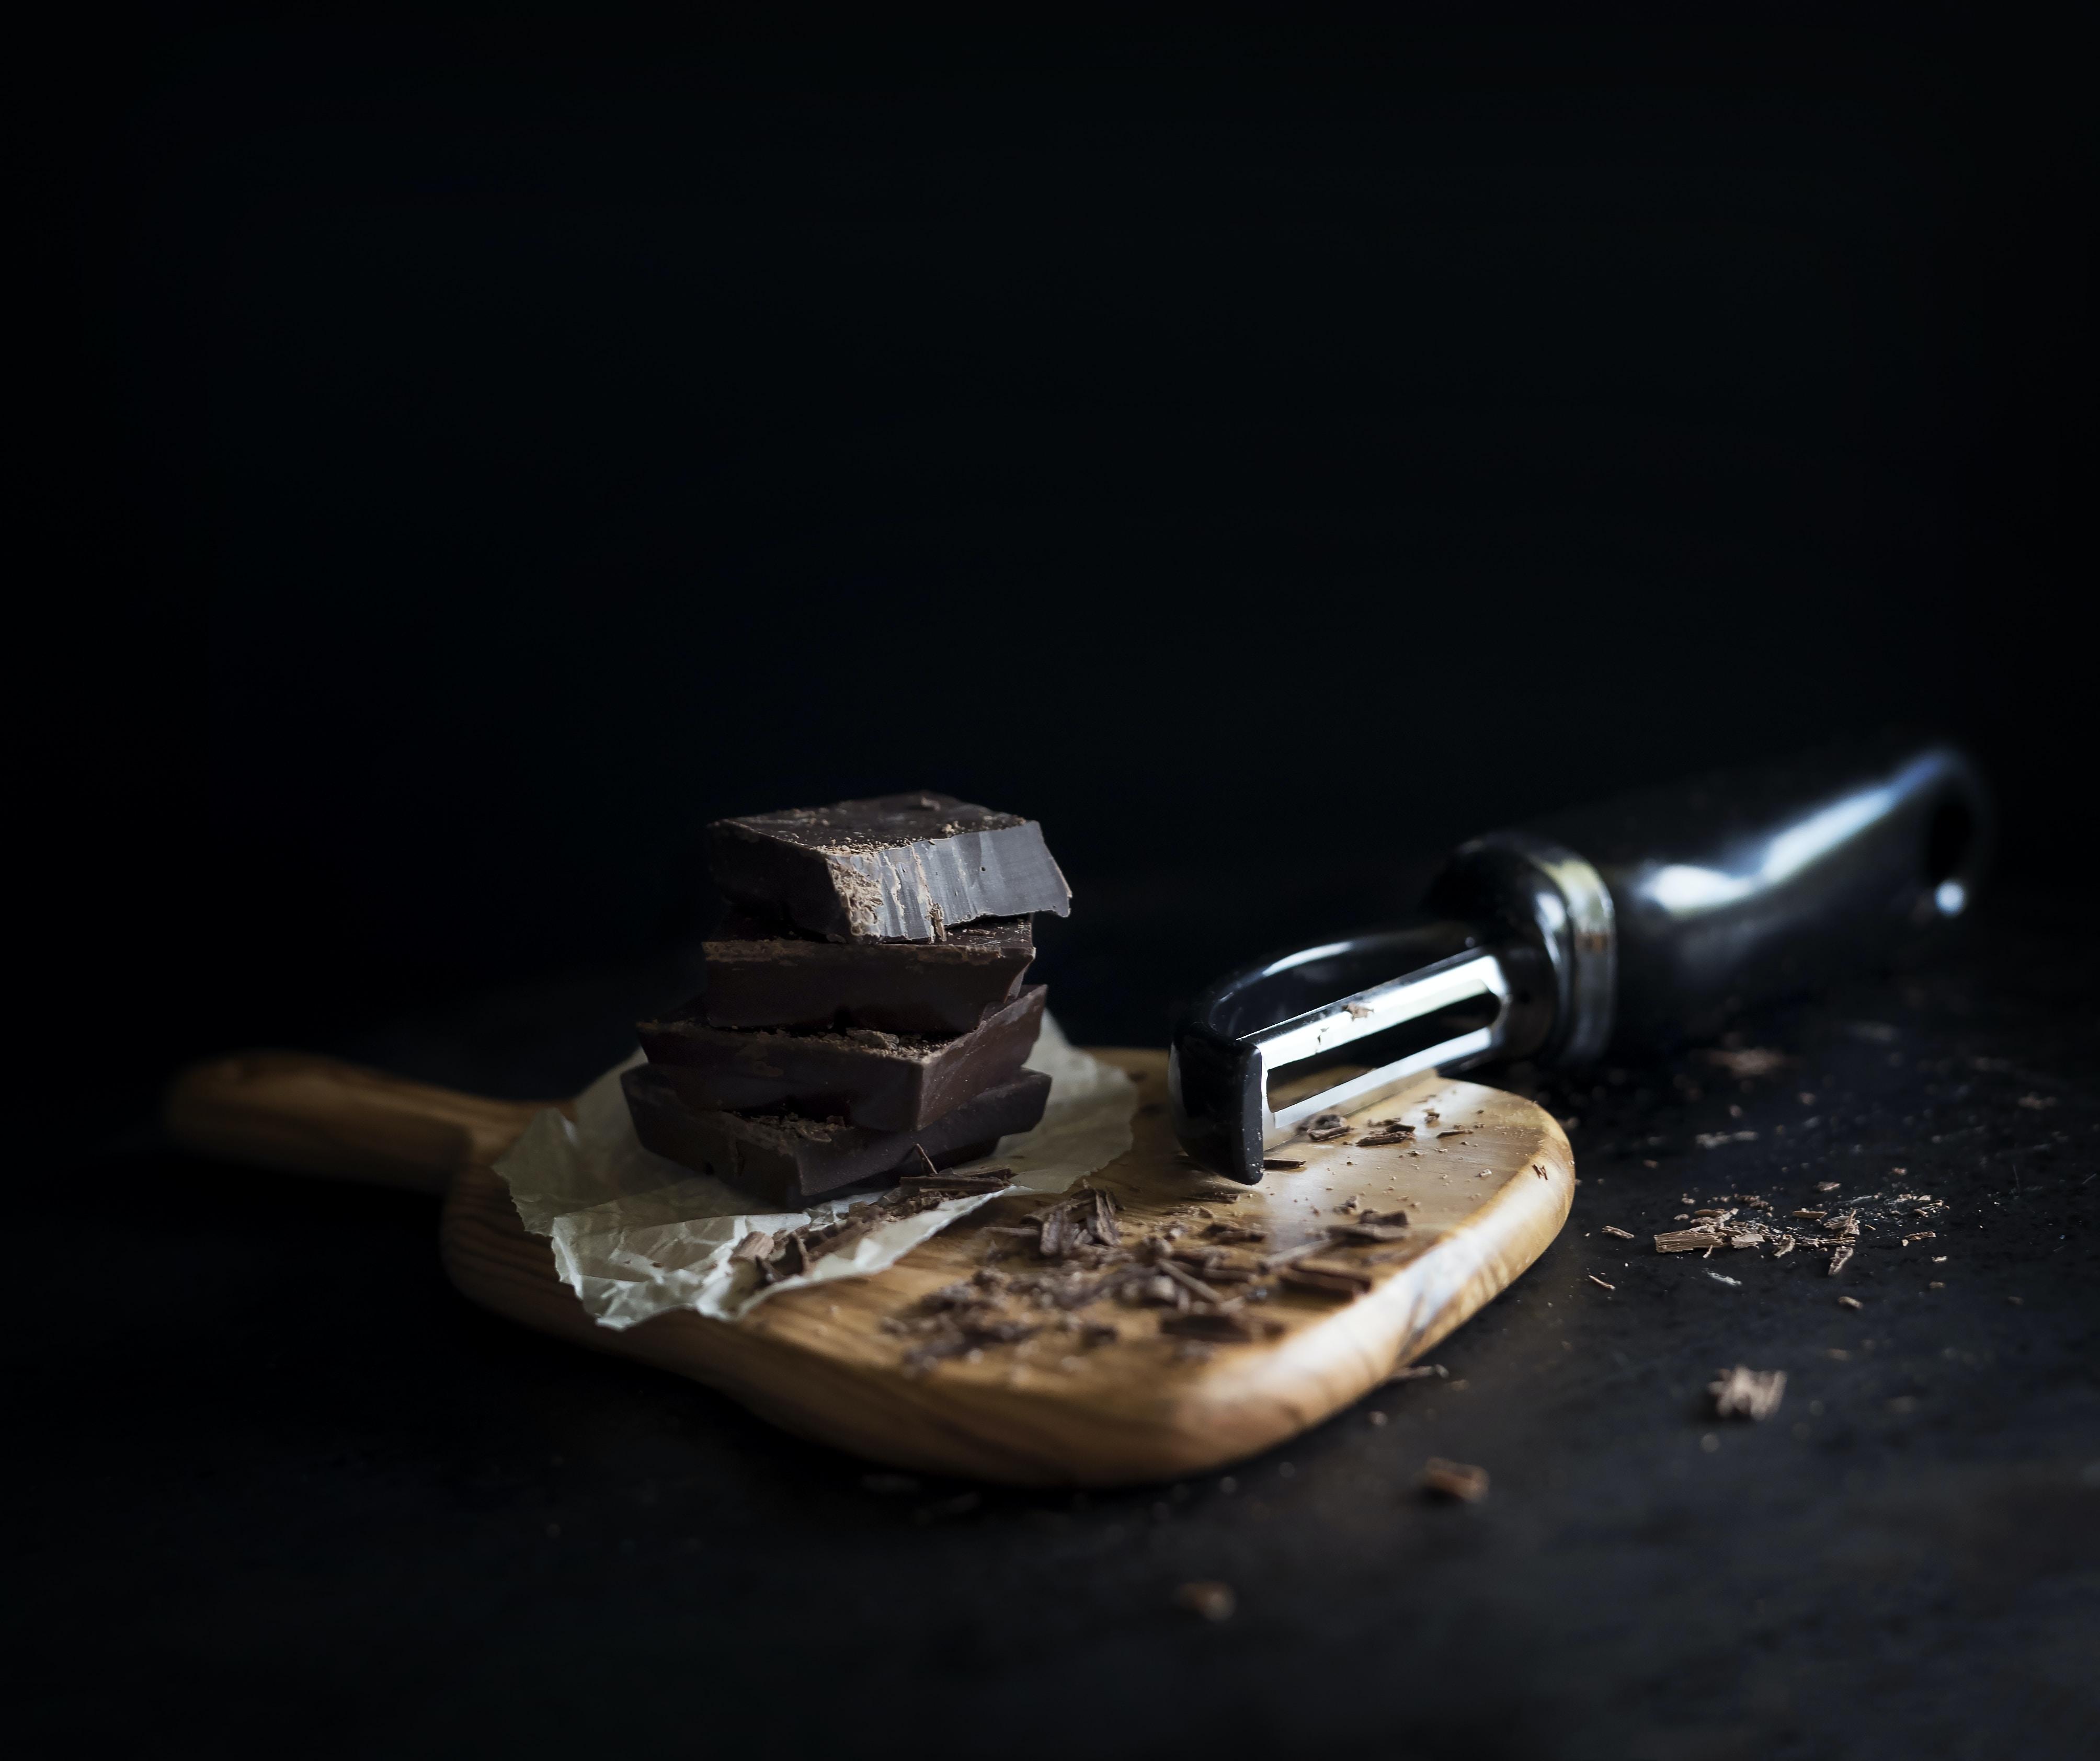 Food peeler shreds blocks of dark chocolate on a cutting board